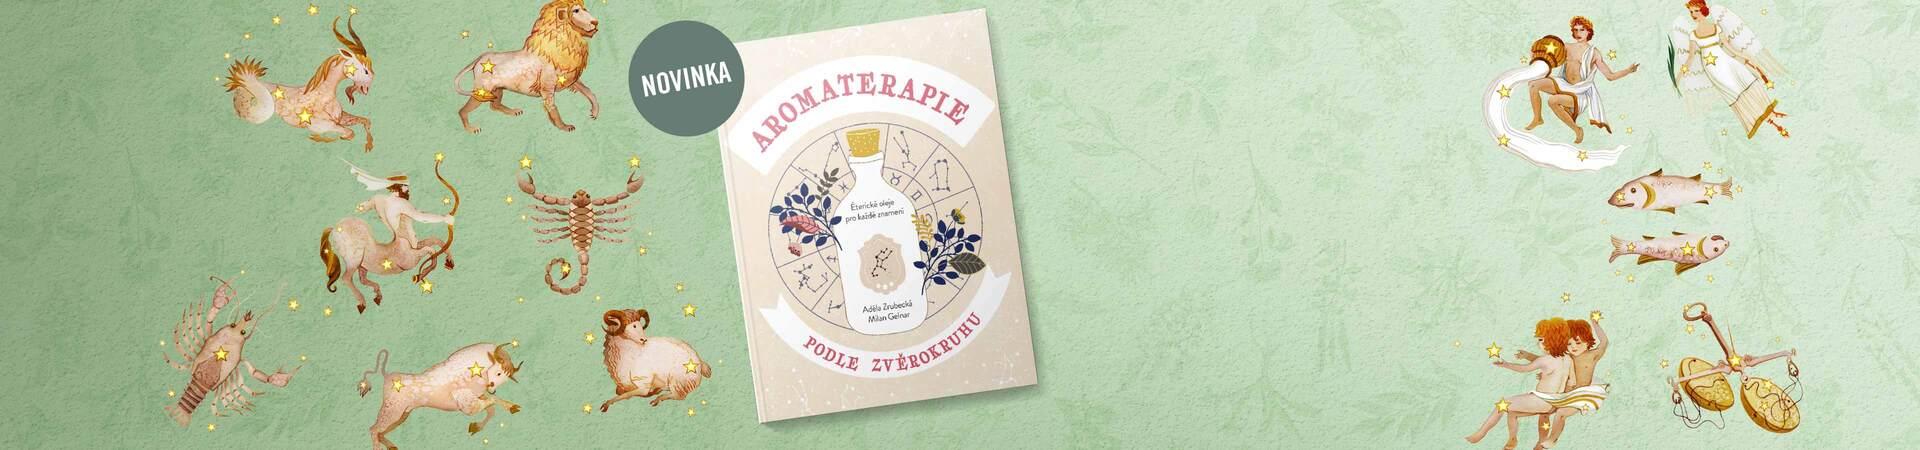 kniha aromaterapia podľa zverokruhu